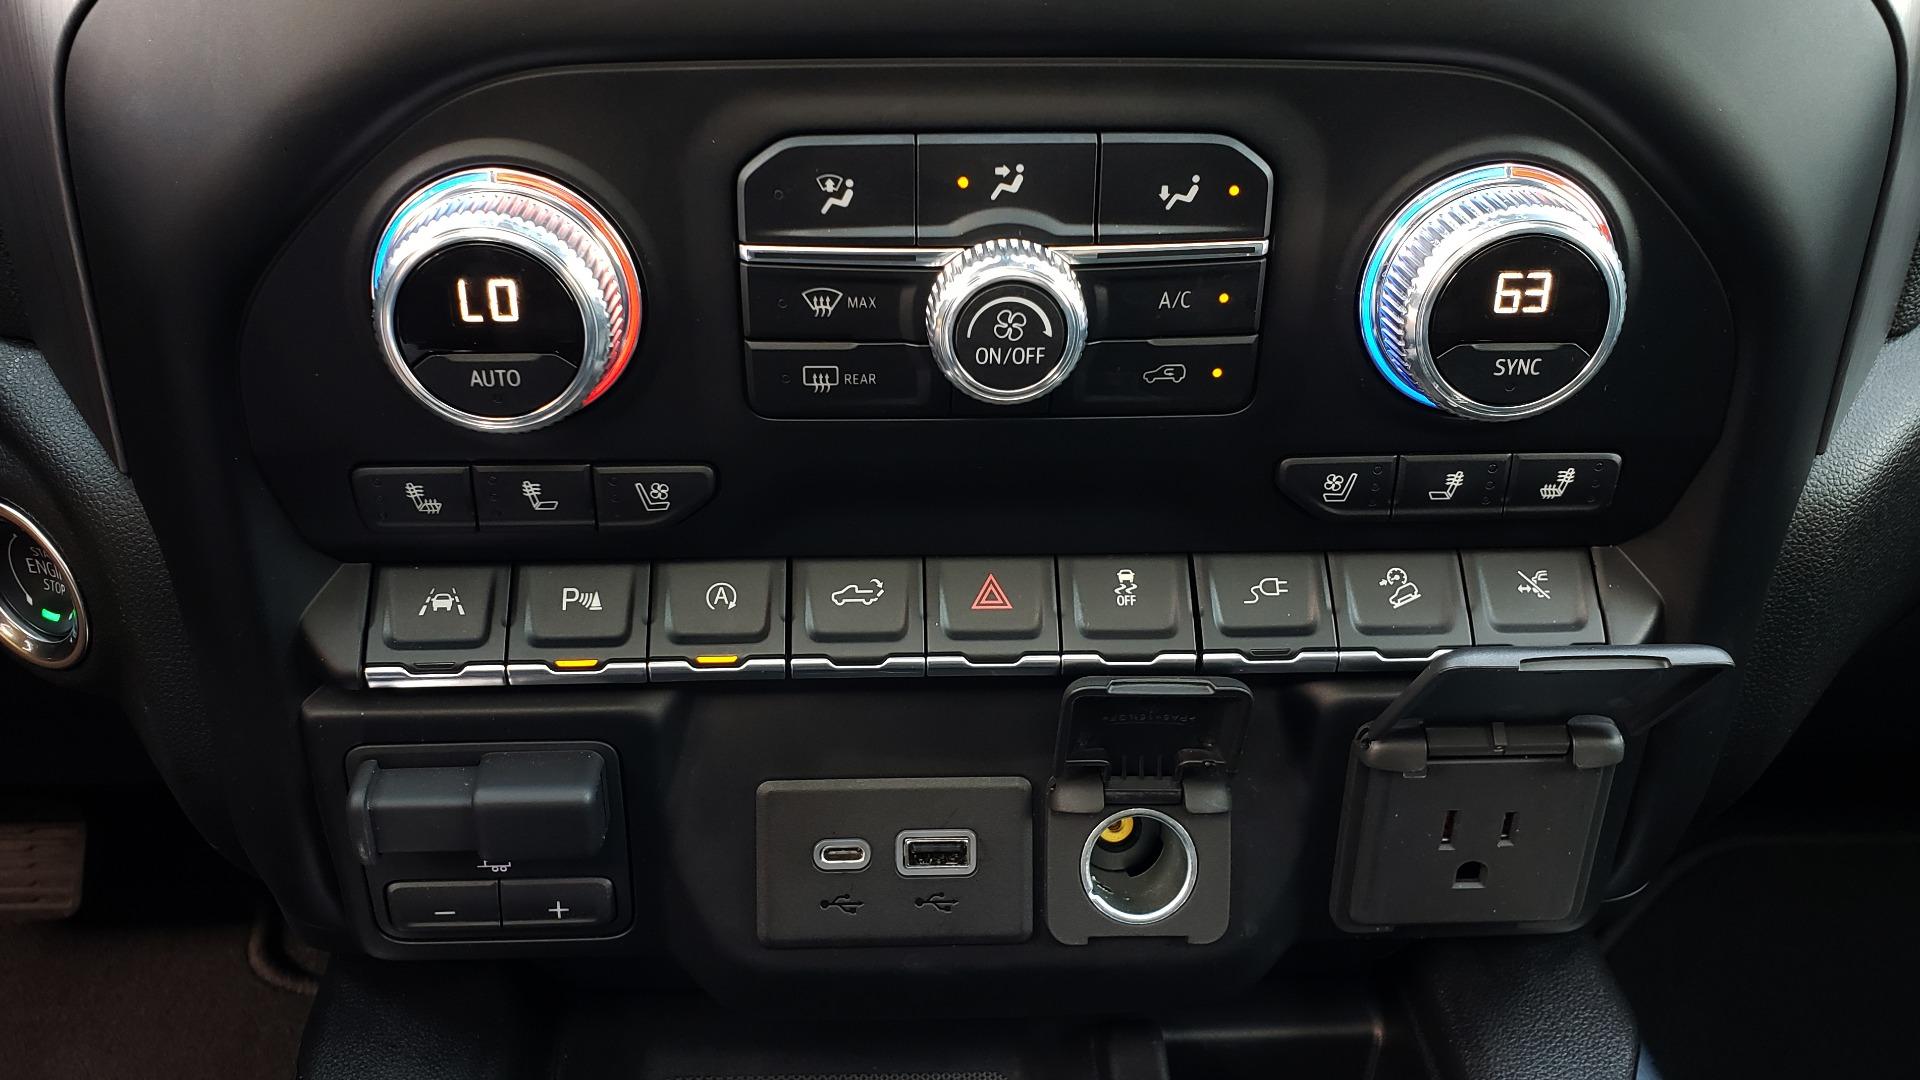 Used 2019 GMC SIERRA 1500 DENALI ULTIMATE 4WD / NAV / TECH PKG / DRVR ALRT for sale Sold at Formula Imports in Charlotte NC 28227 53